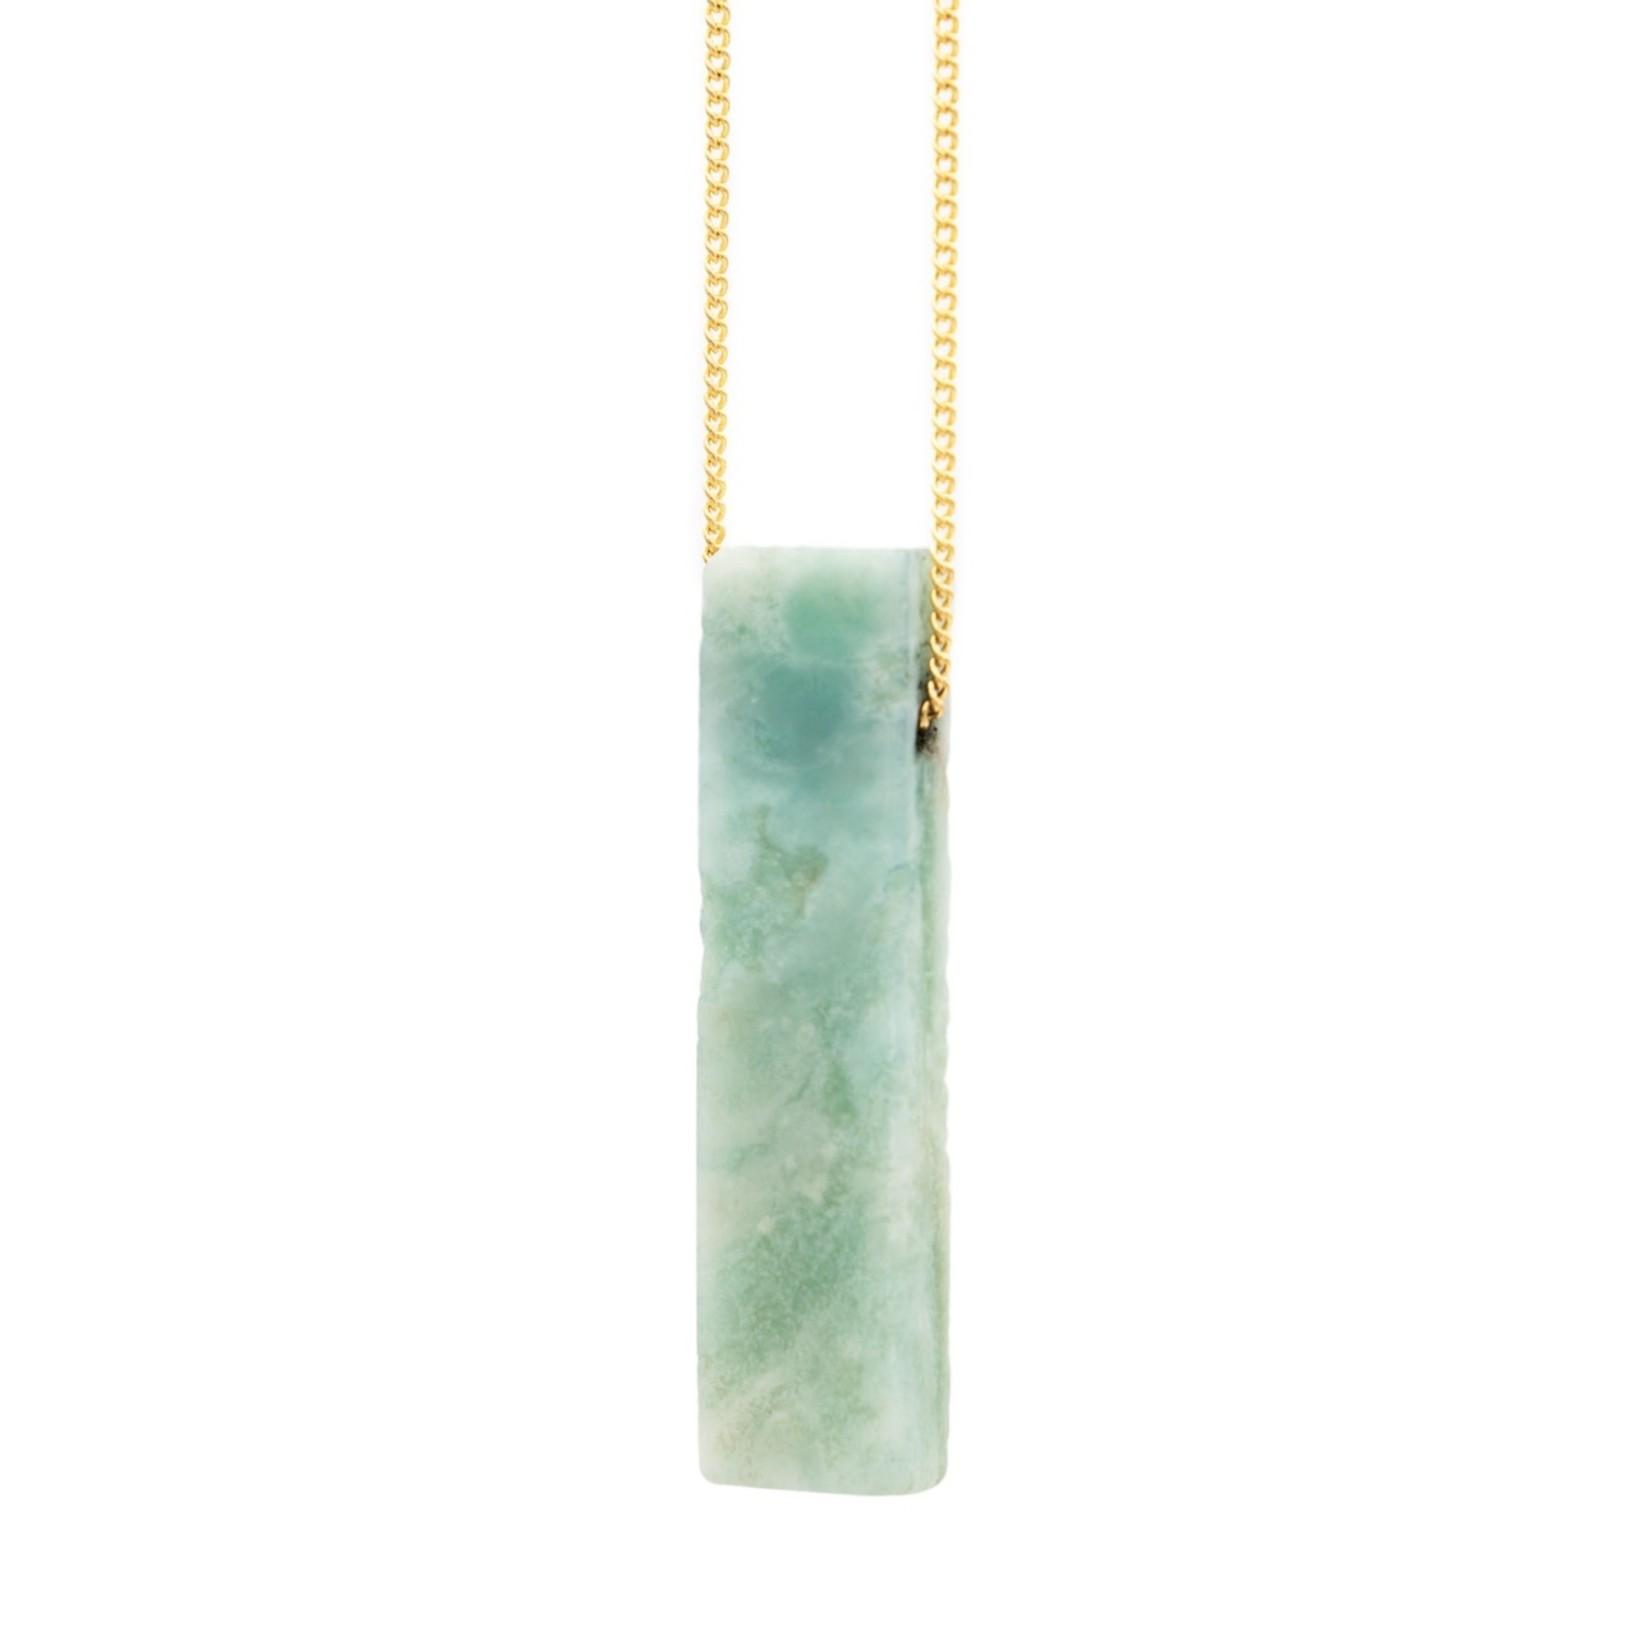 "Mana Made Jewelry Mana 28"" Stone Necklace Amazonite"